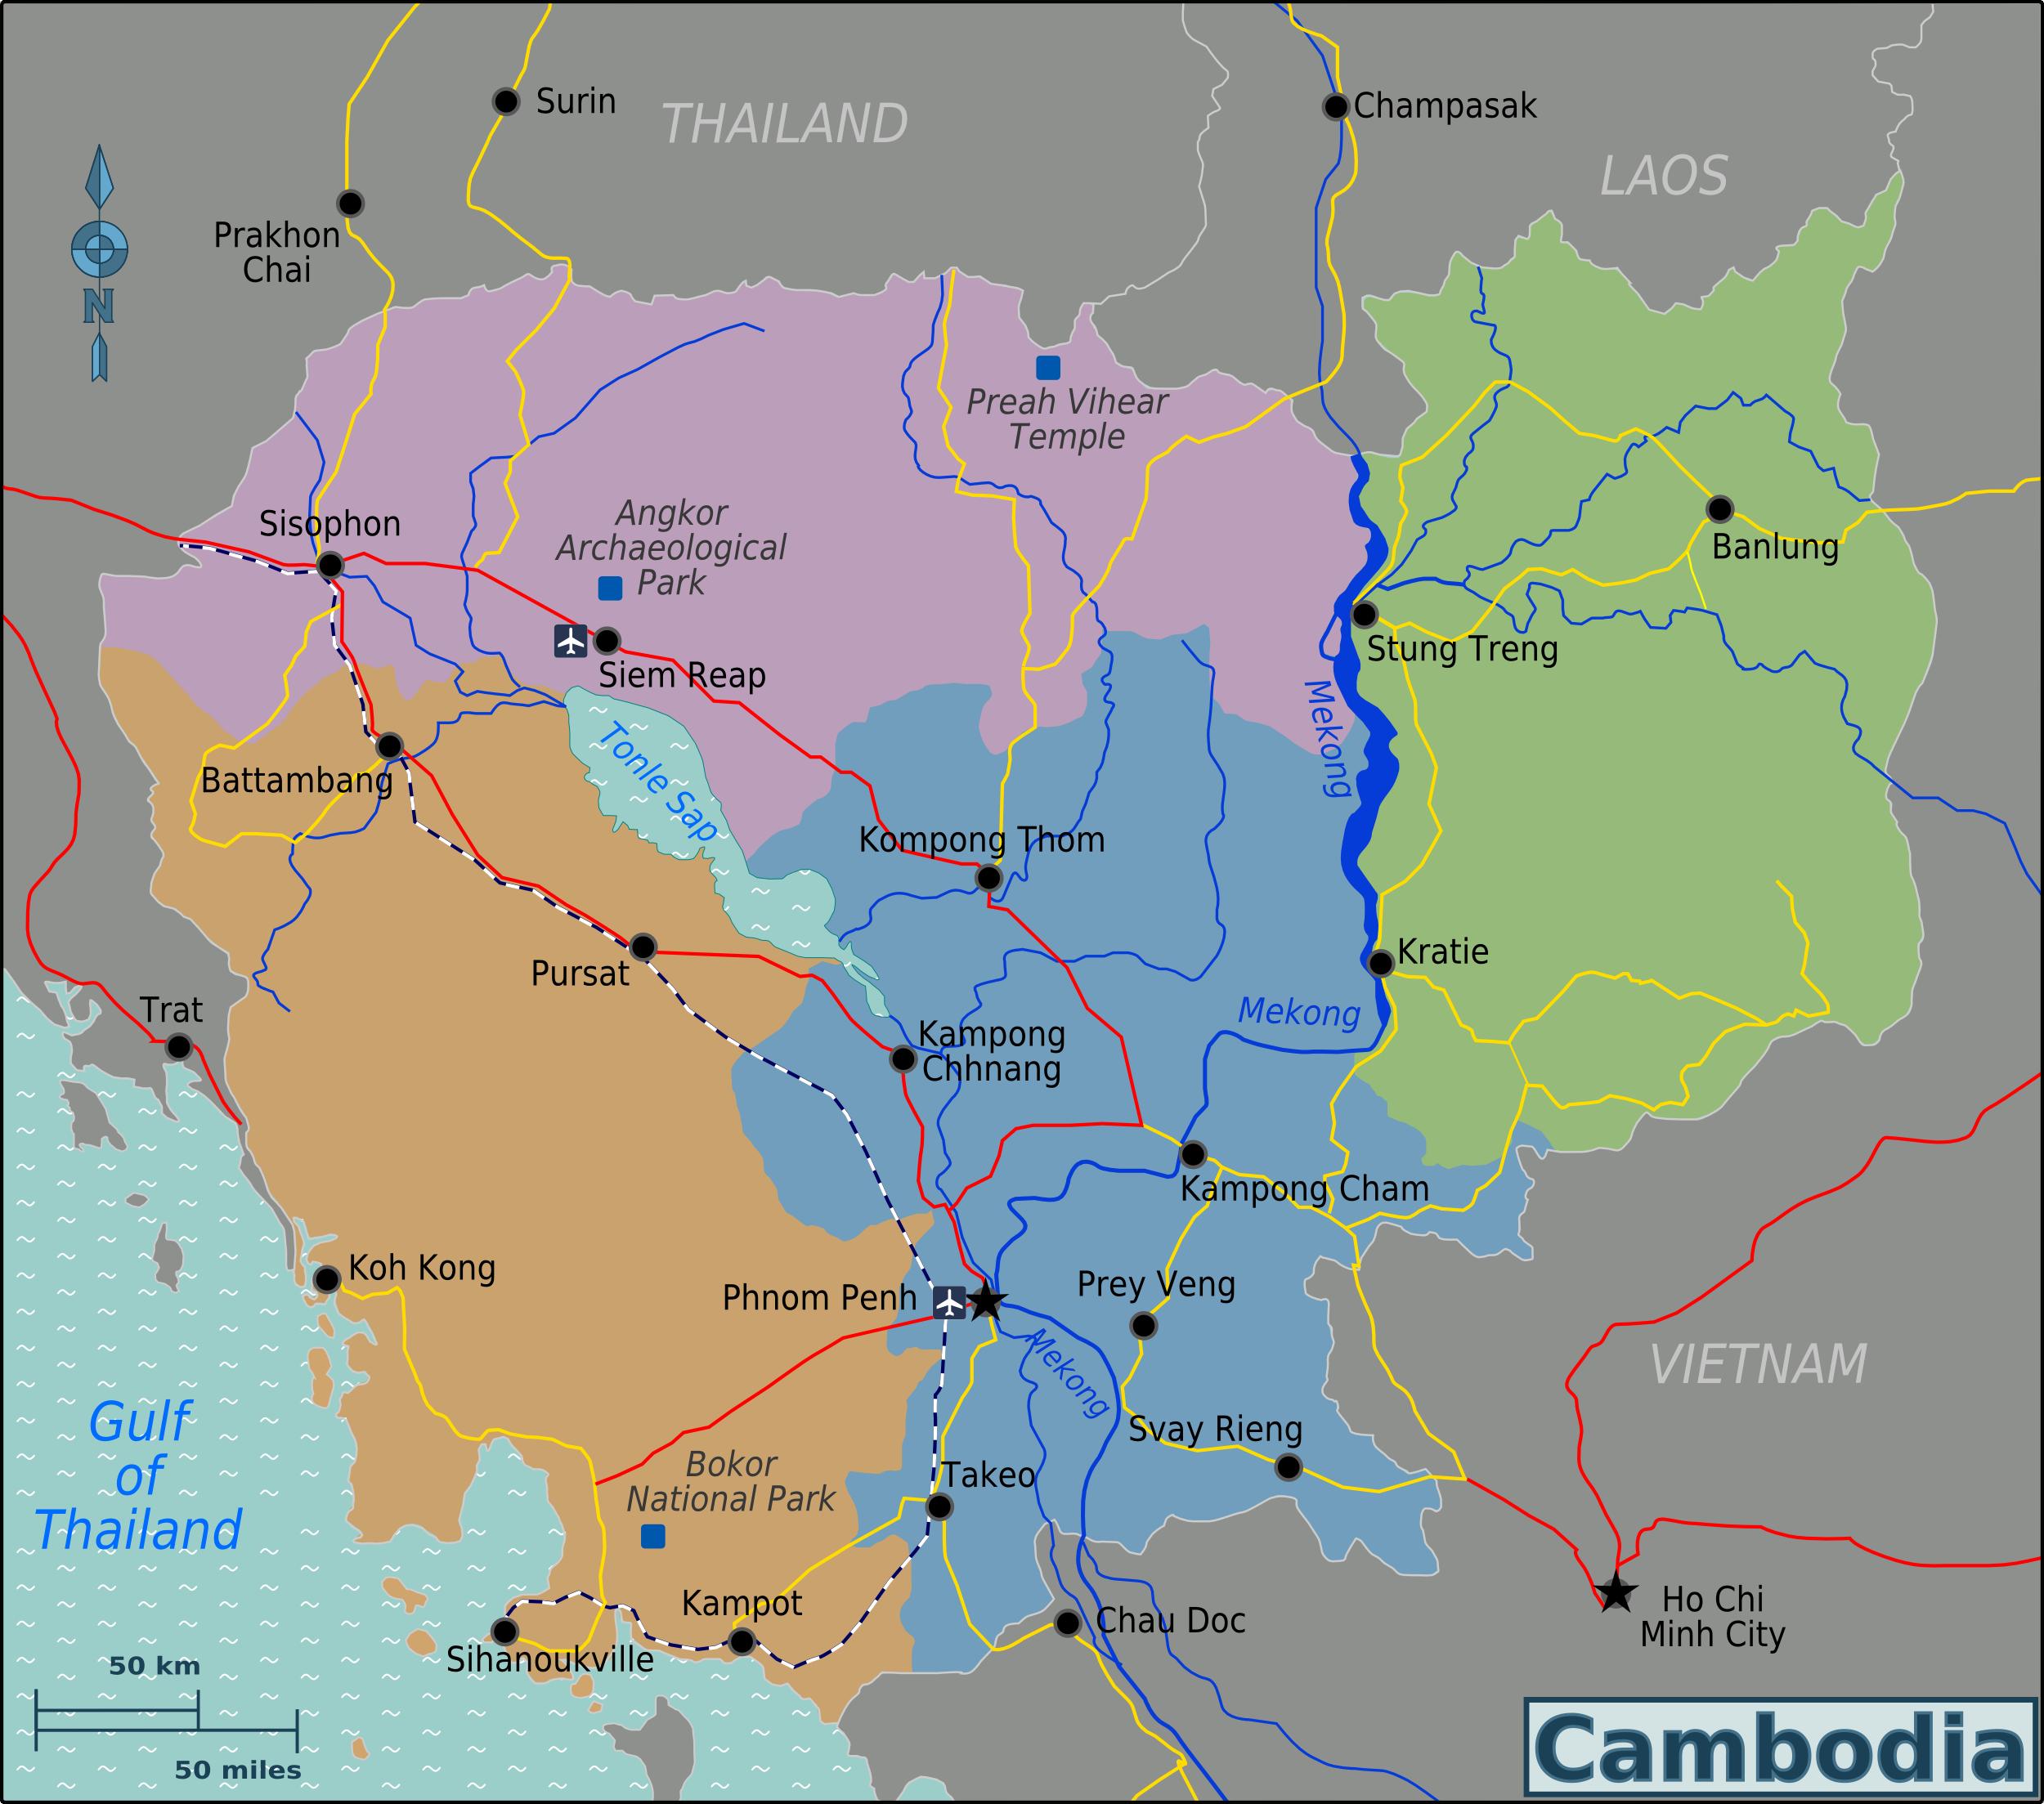 Kambodscha Karte.Landkarte Kambodscha Karte Regionen Weltkarte Com